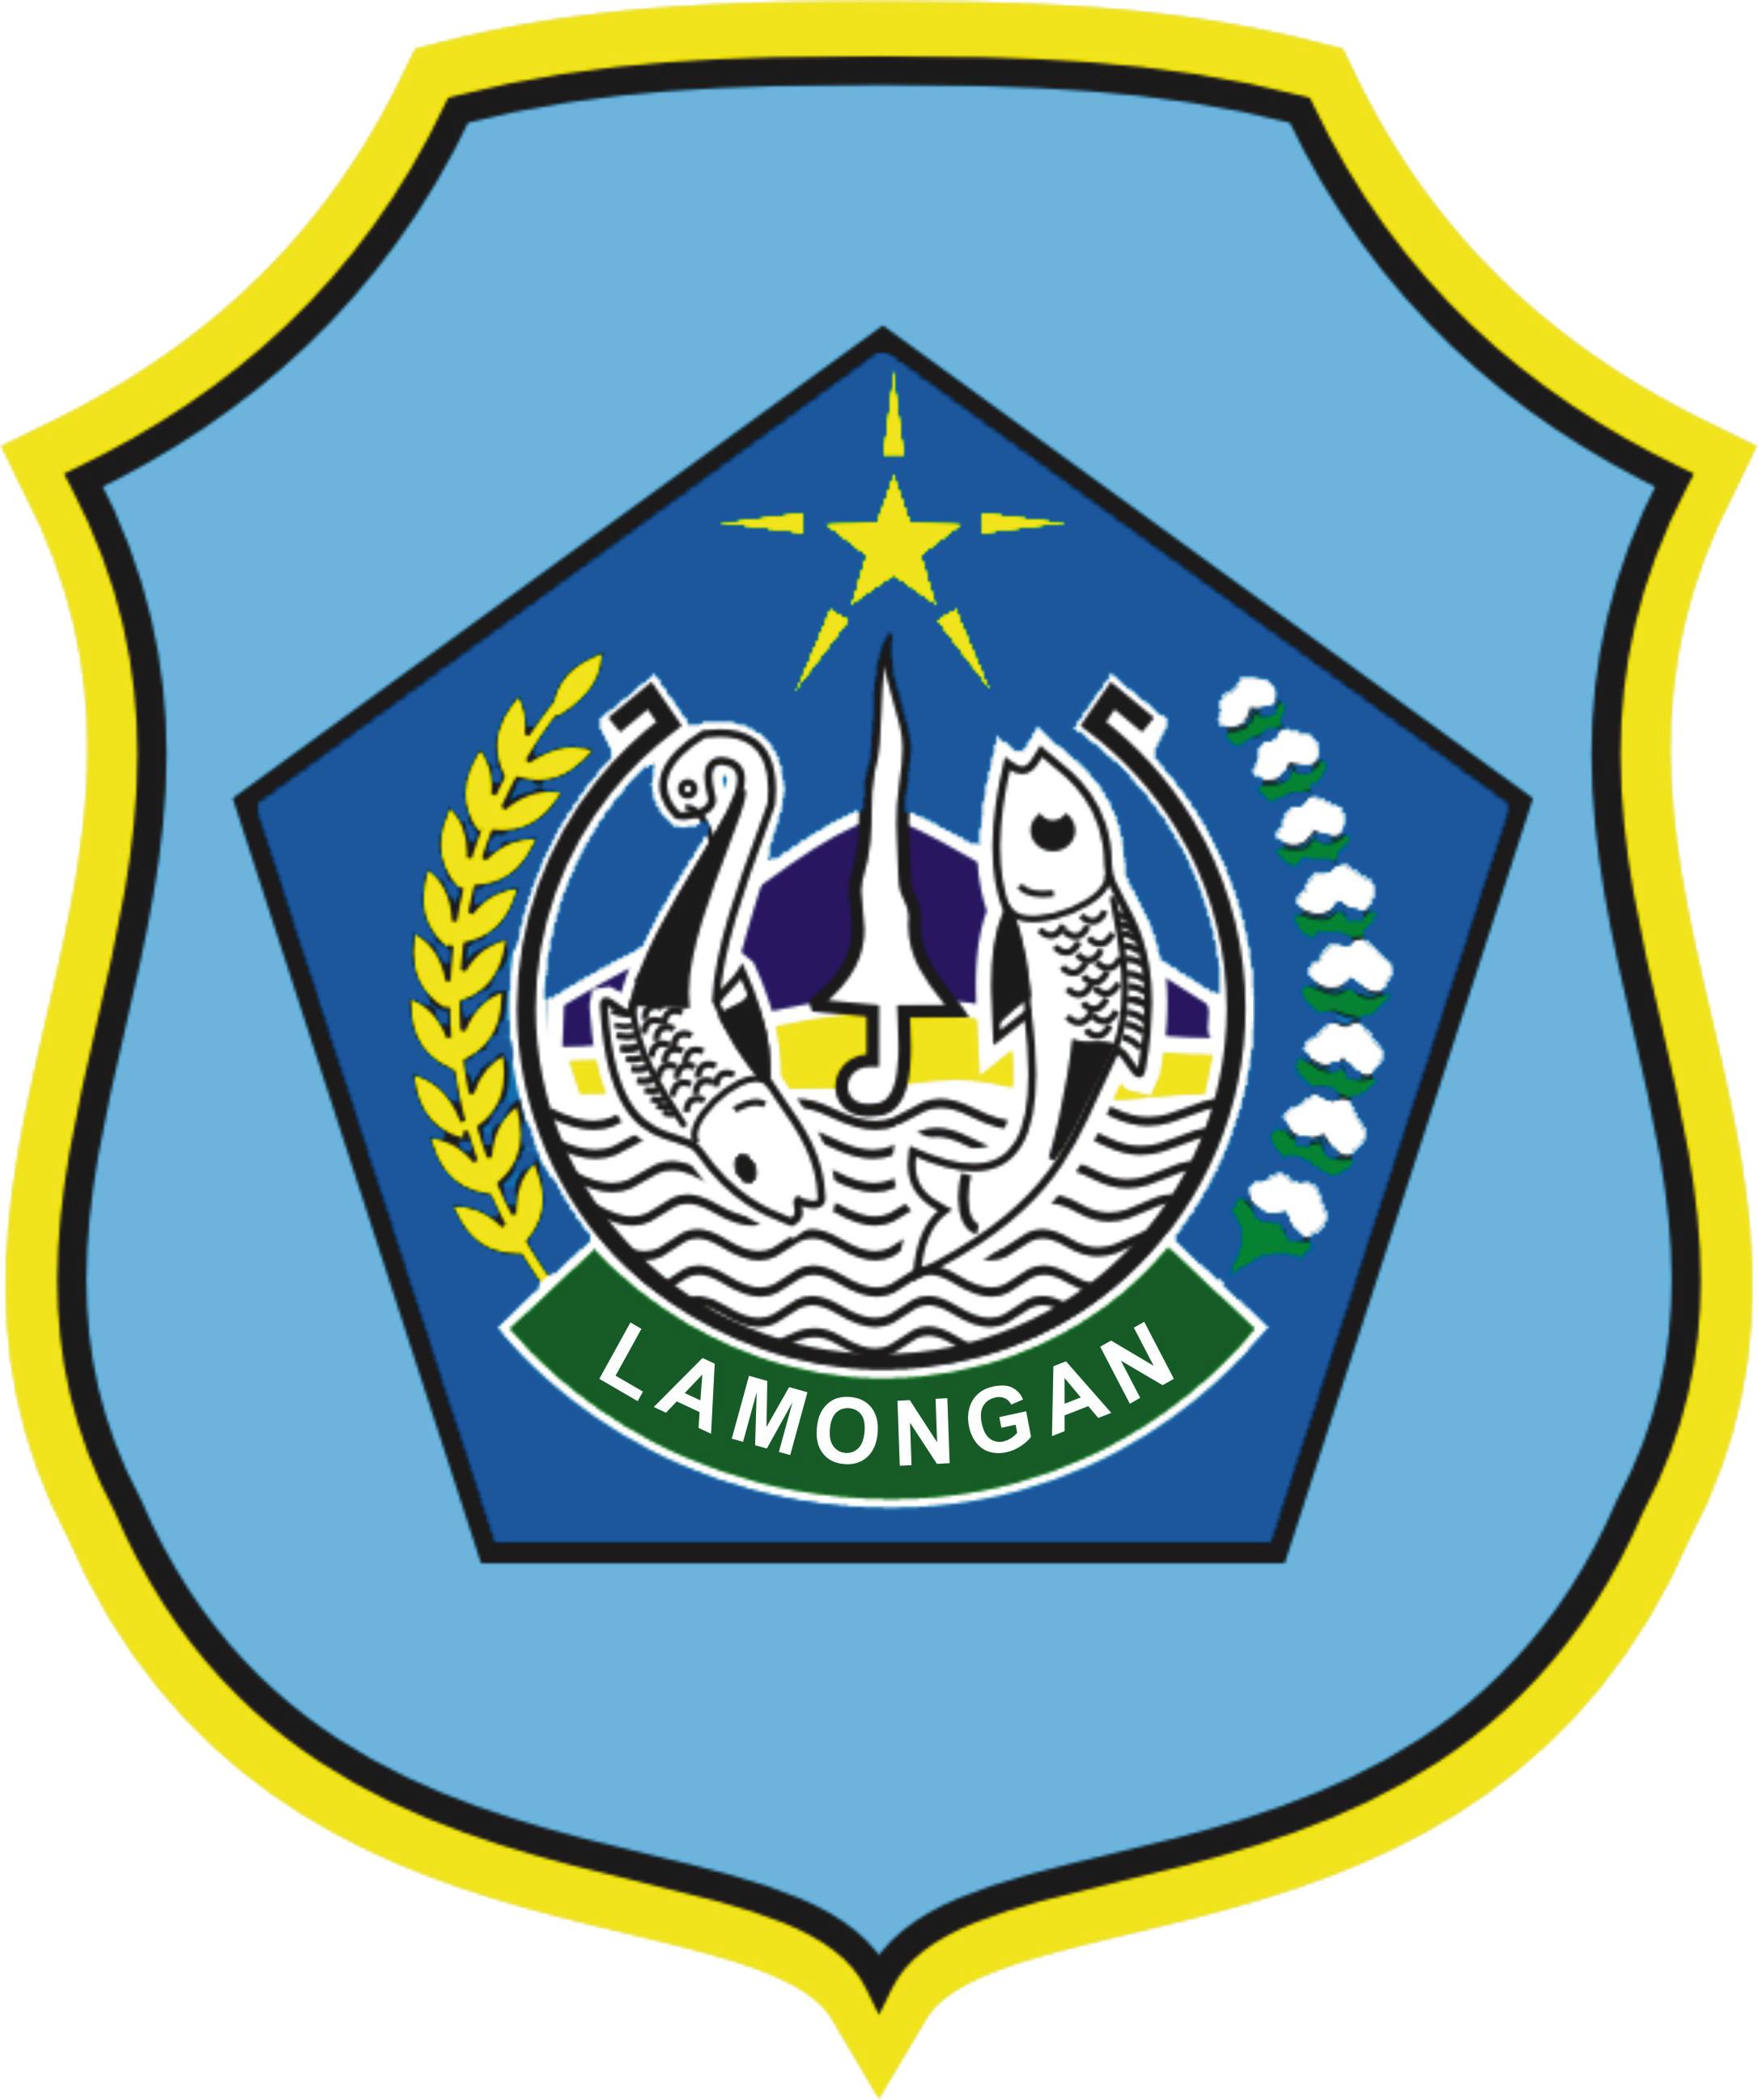 Hasil gambar untuk kab lamongan logo